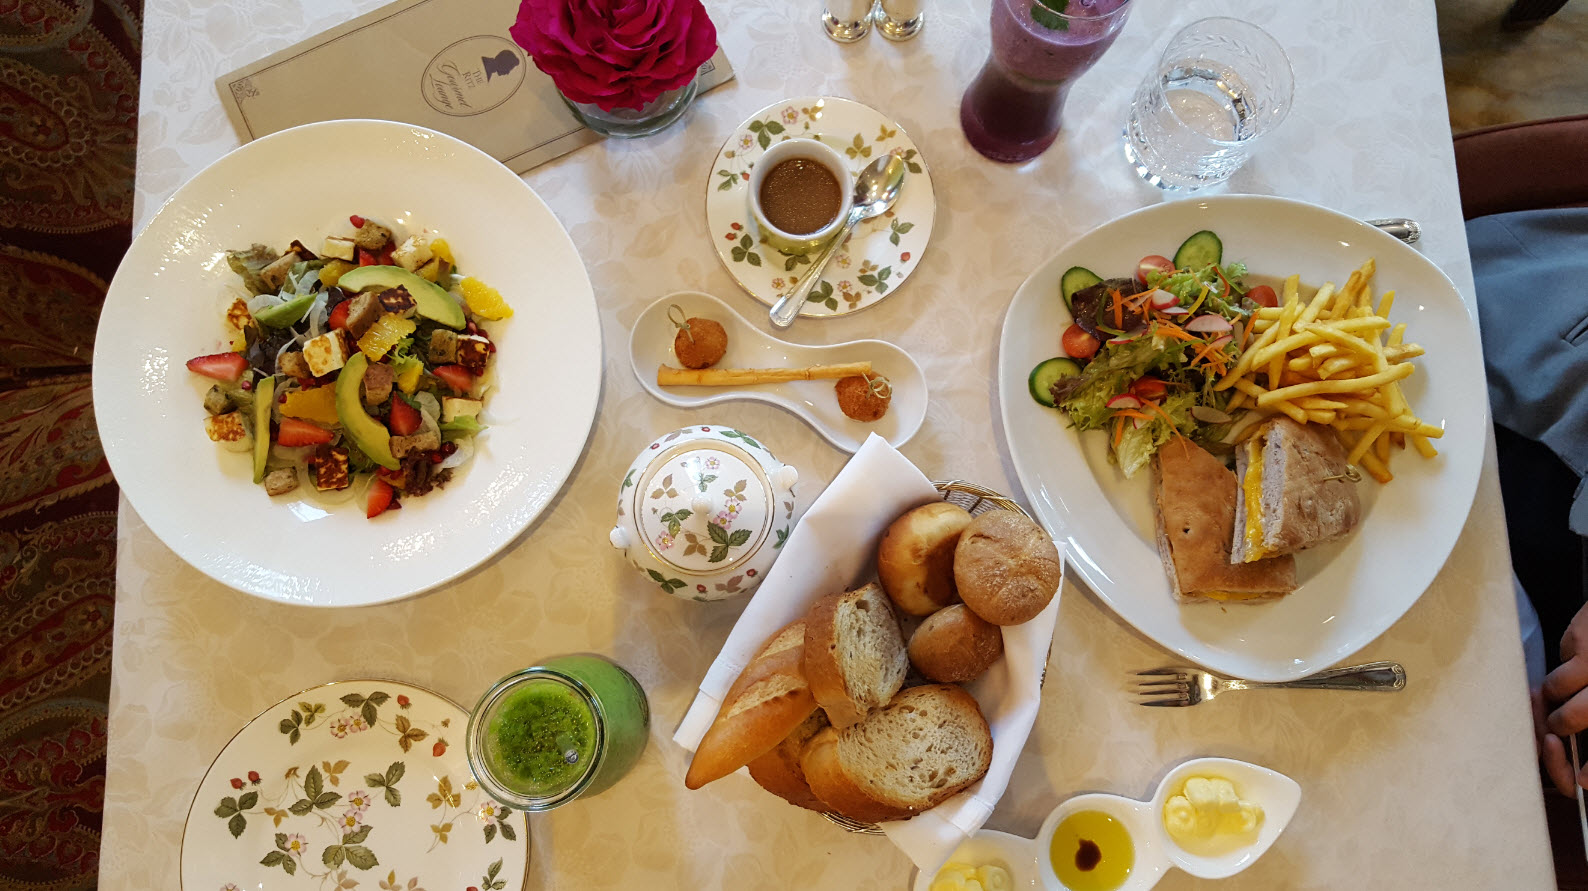 Dejeuner Ritz Gourmet Lounge Bahrain